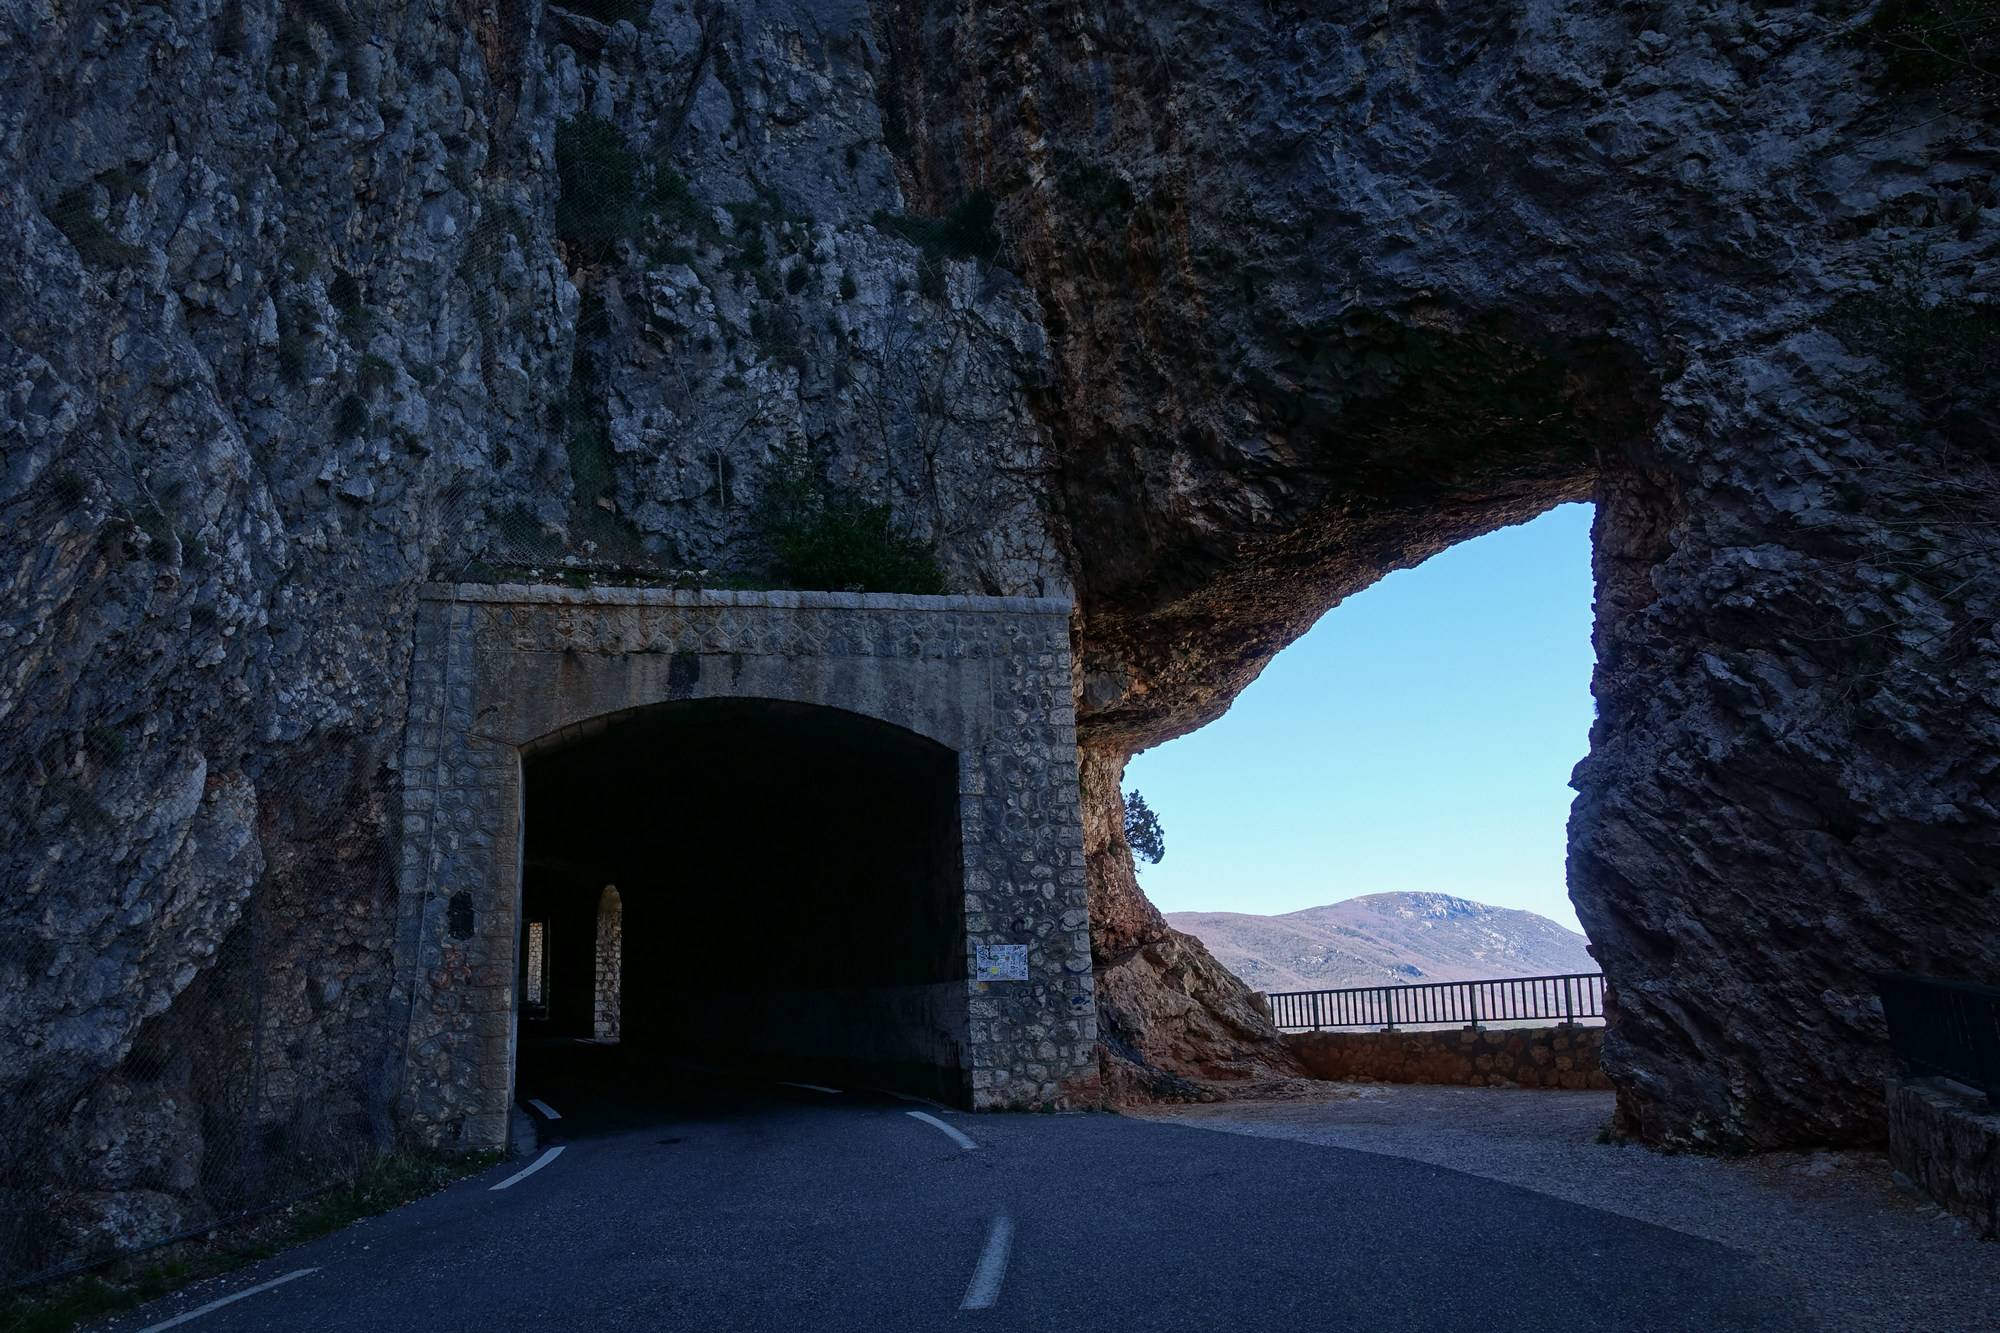 Tunnel du Fayet